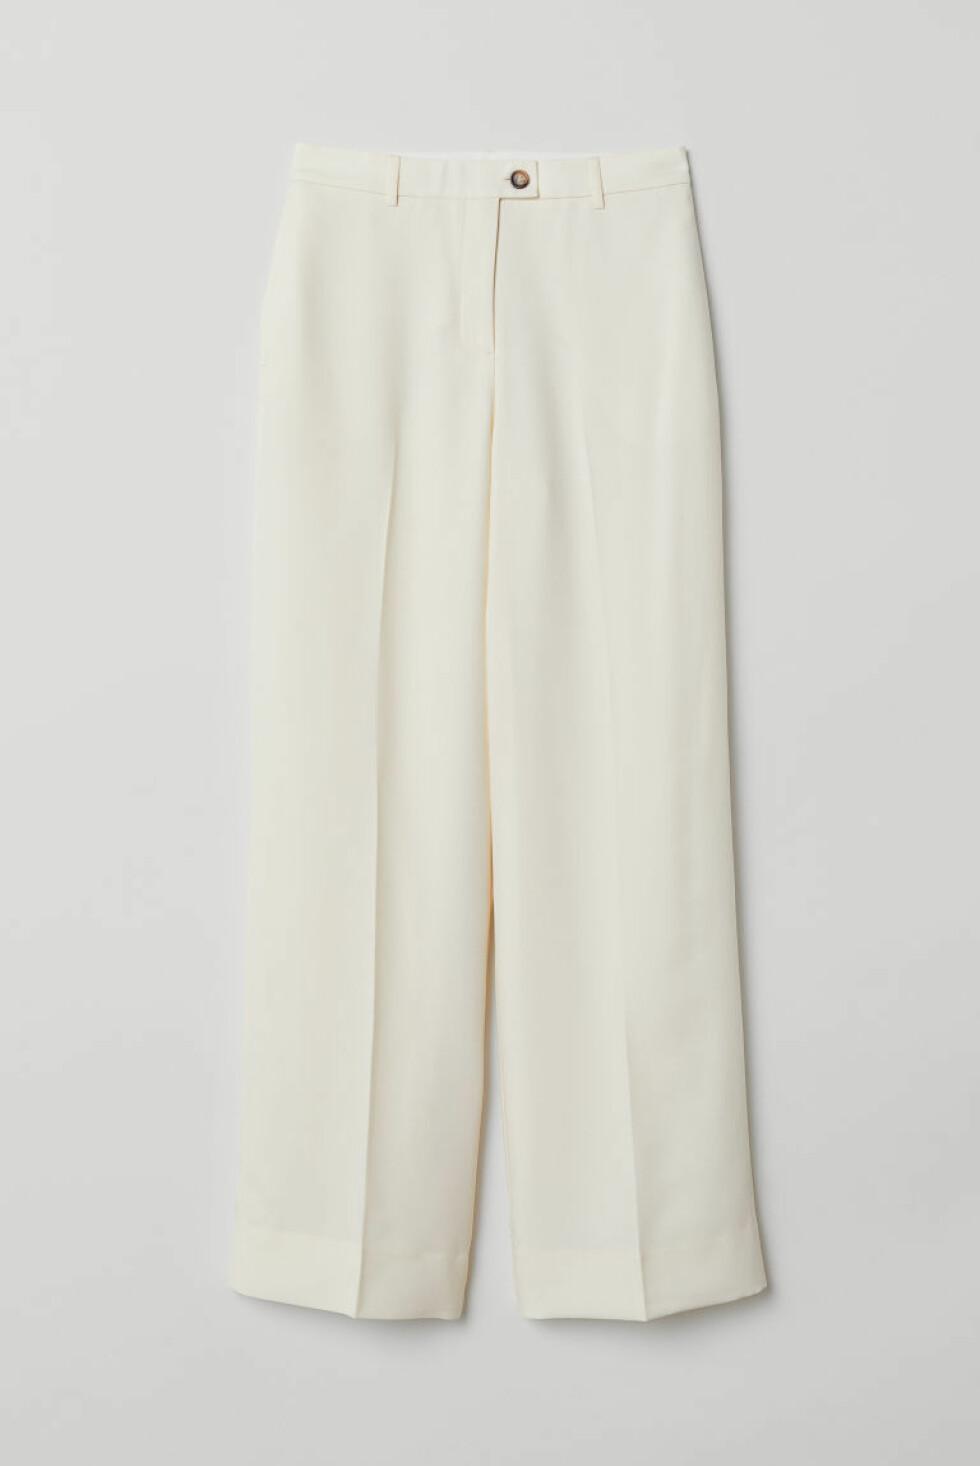 Bukse fra H&M |499,-| https://www2.hm.com/no_no/productpage.0692653004.html